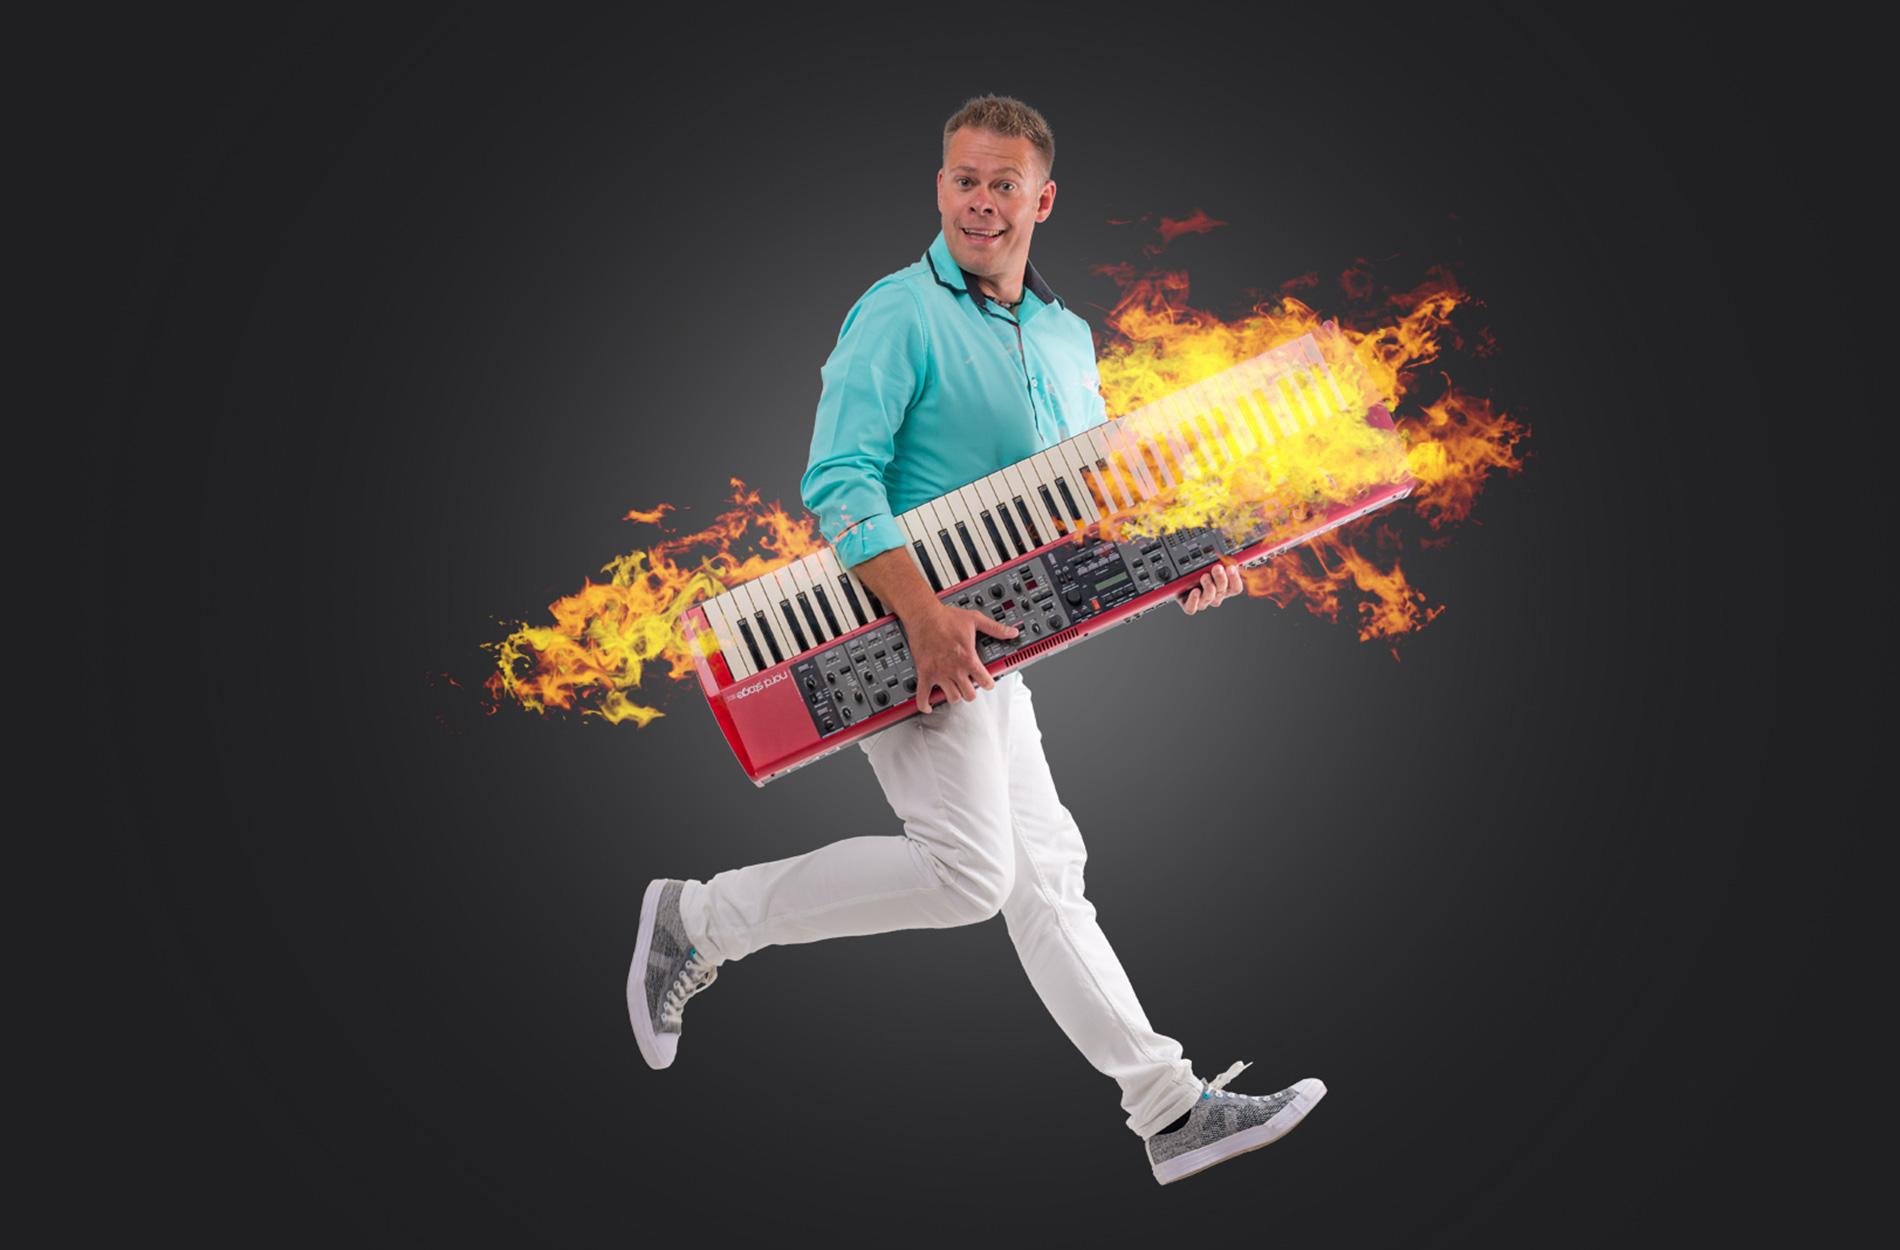 Mihcael mit Keyboard unter dem Arm